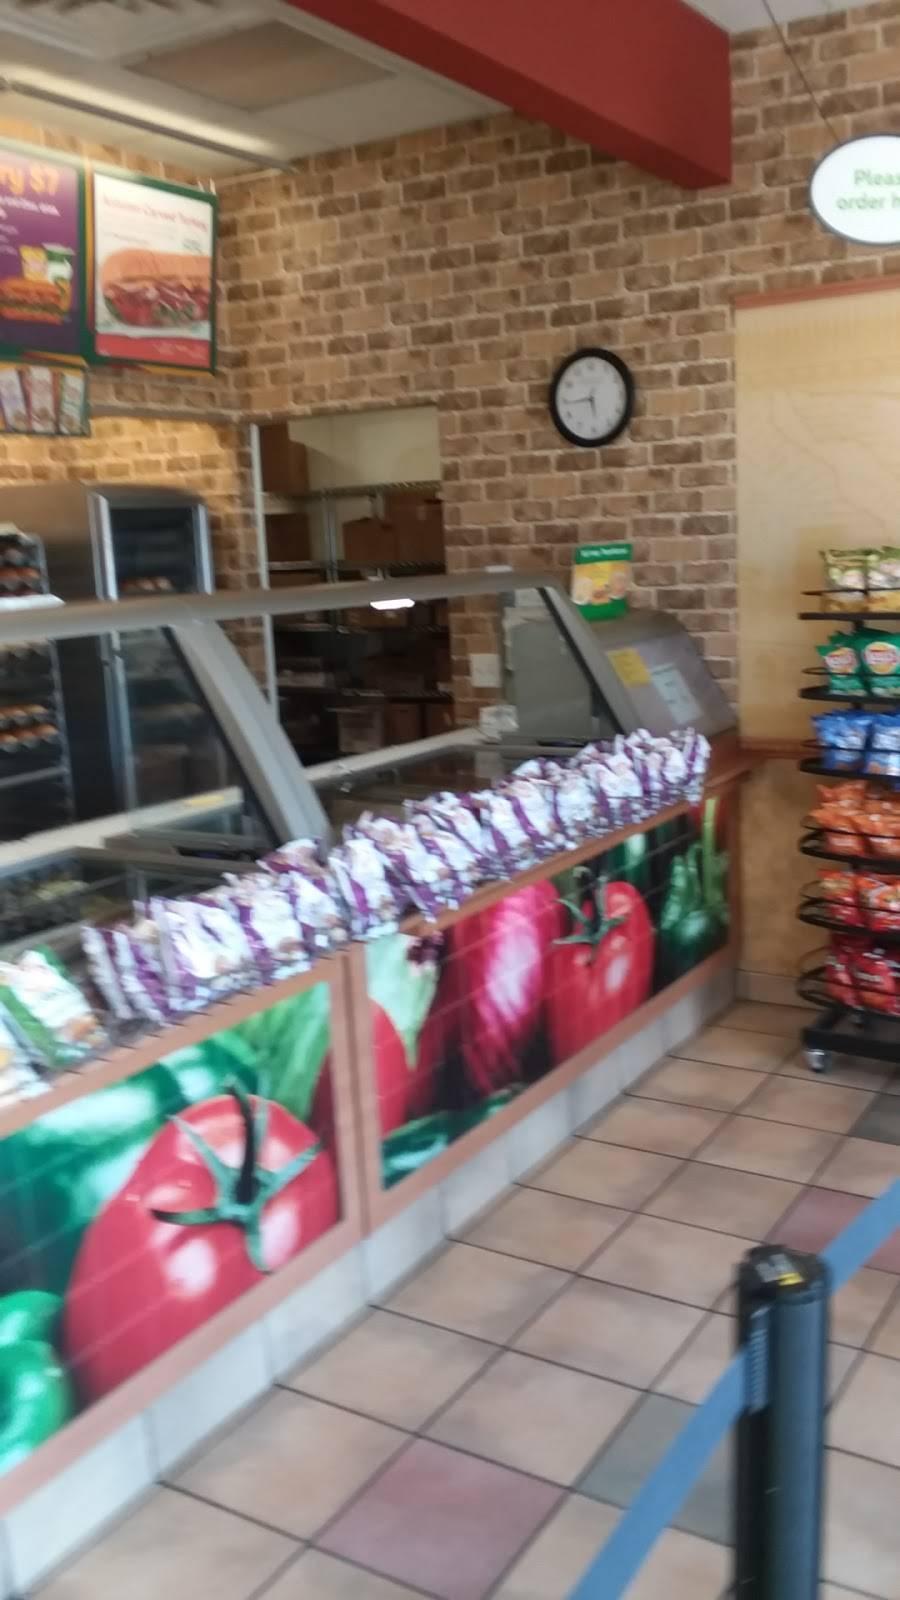 Subway | restaurant | 9440 Garland Rd Unit 710, Dallas, TX 75218, USA | 2143216823 OR +1 214-321-6823